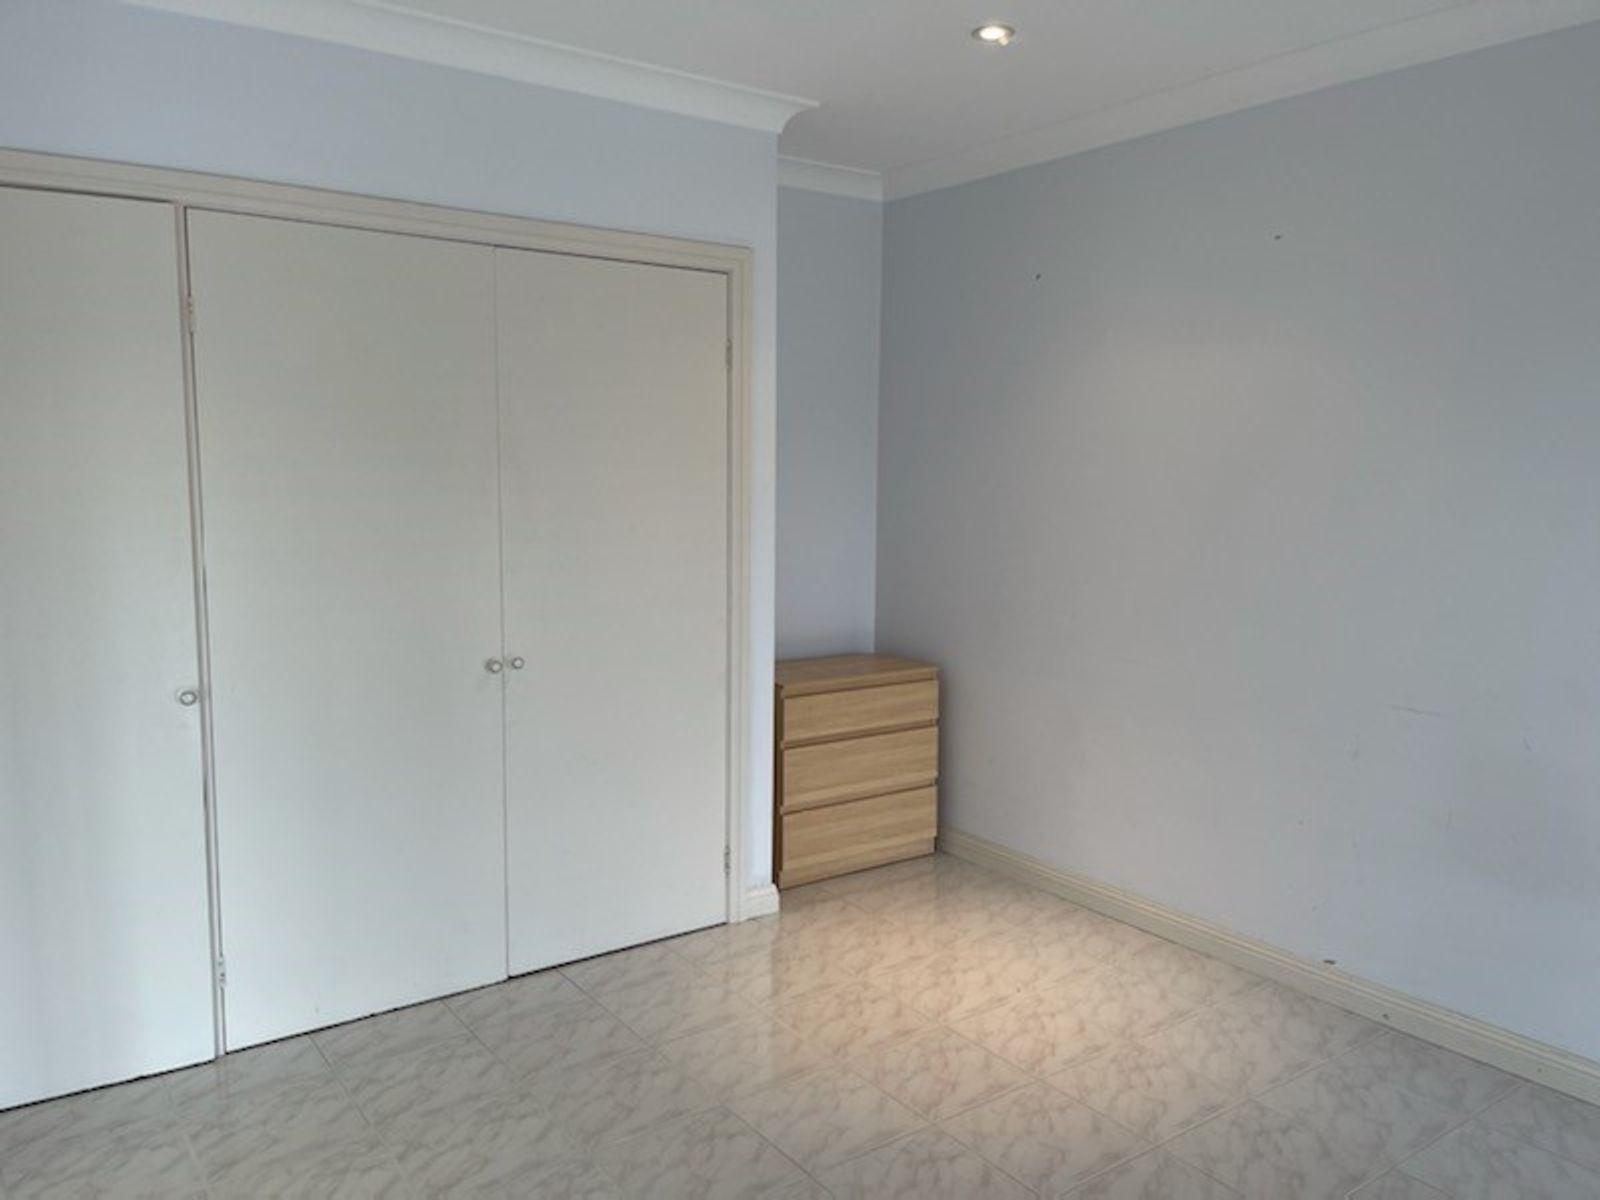 89A Haigh Avenue, Belrose, NSW 2085